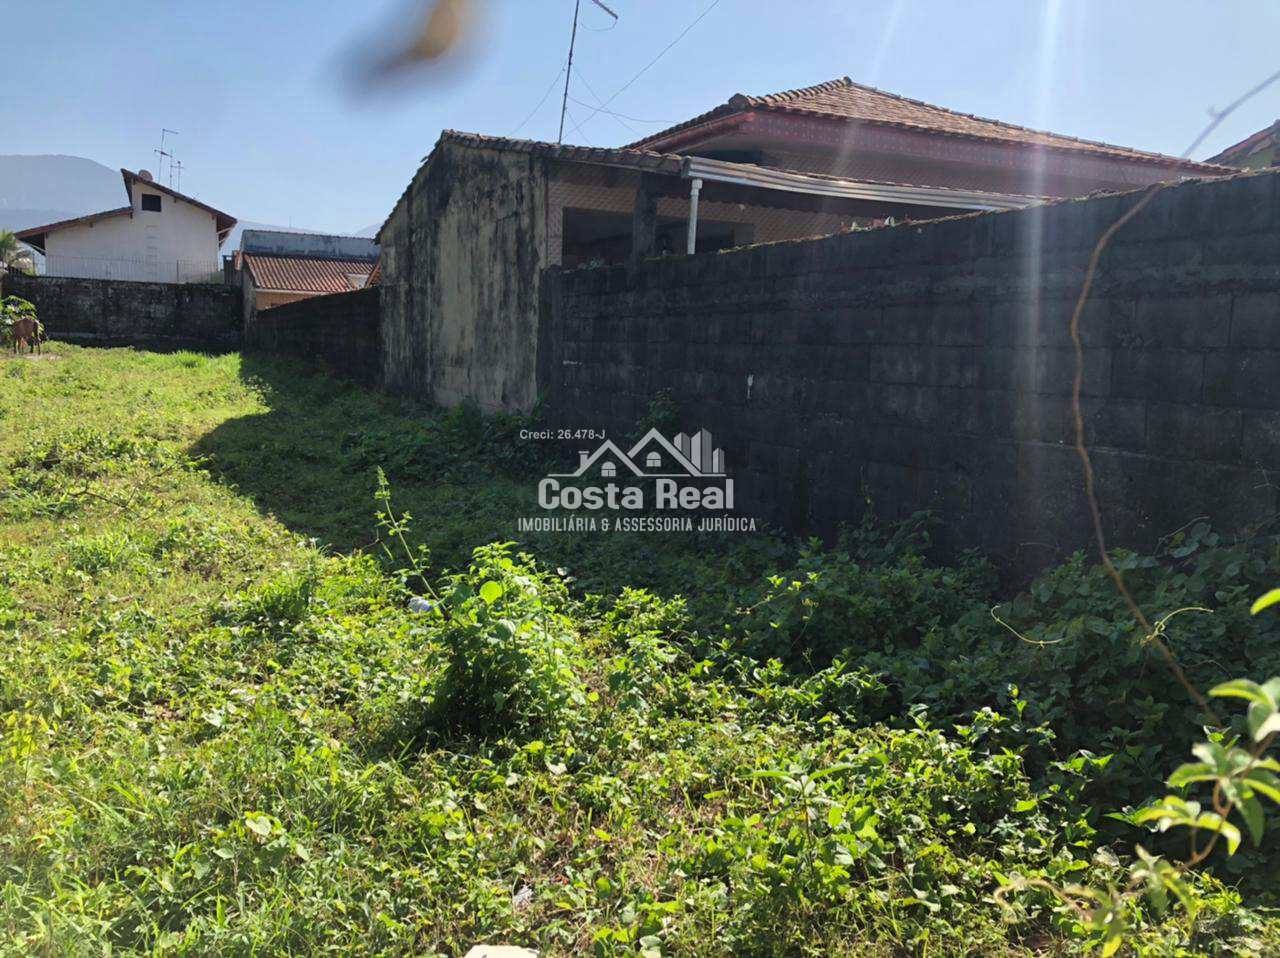 Terreno, Real, Praia Grande - R$ 330 mil, Cod: 1189